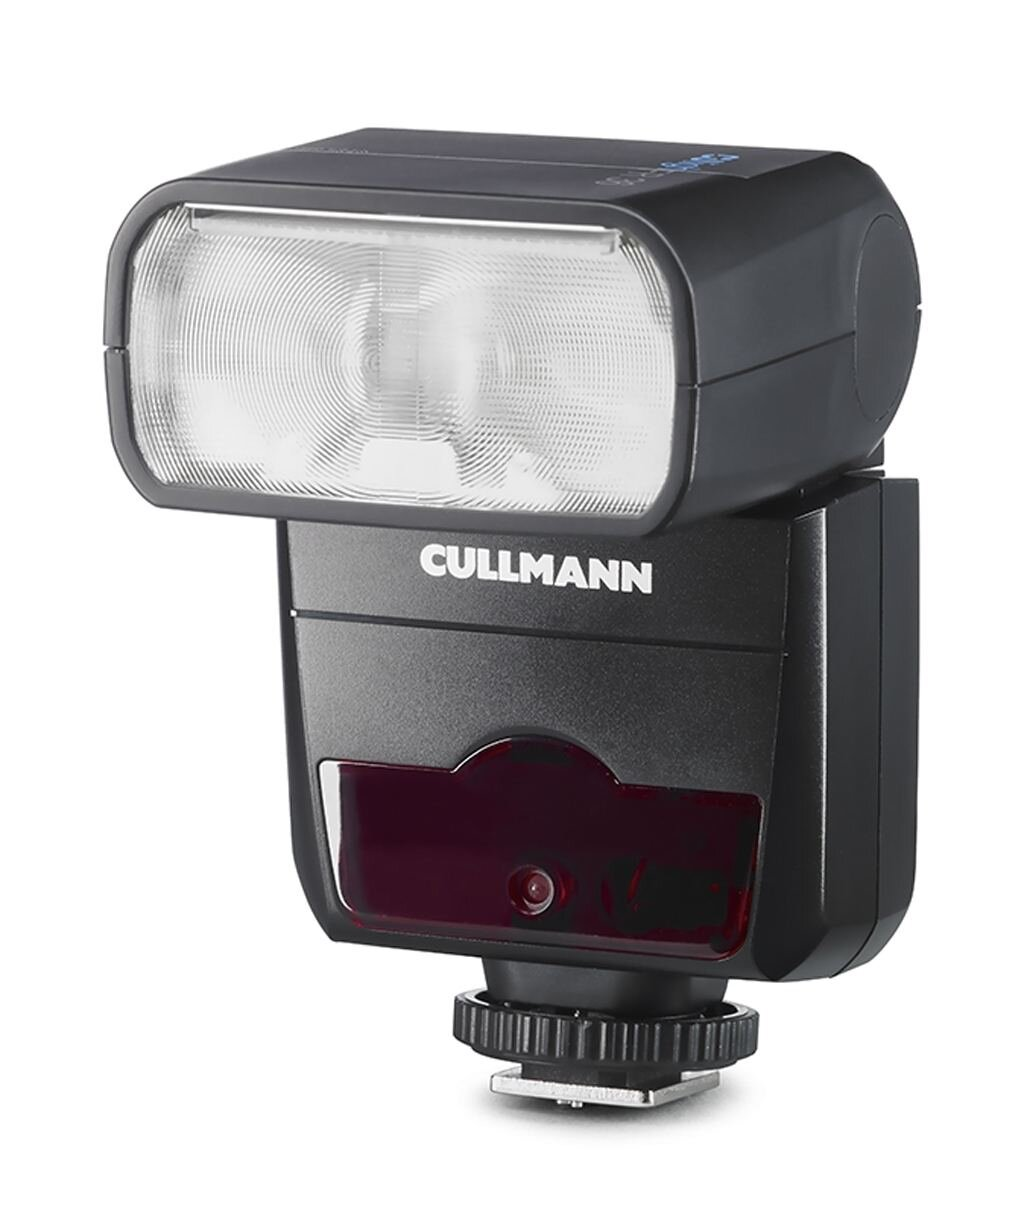 Cullmann CUlight FR 36MFT Blitzgerät für Panasonic/Olympus/Leica